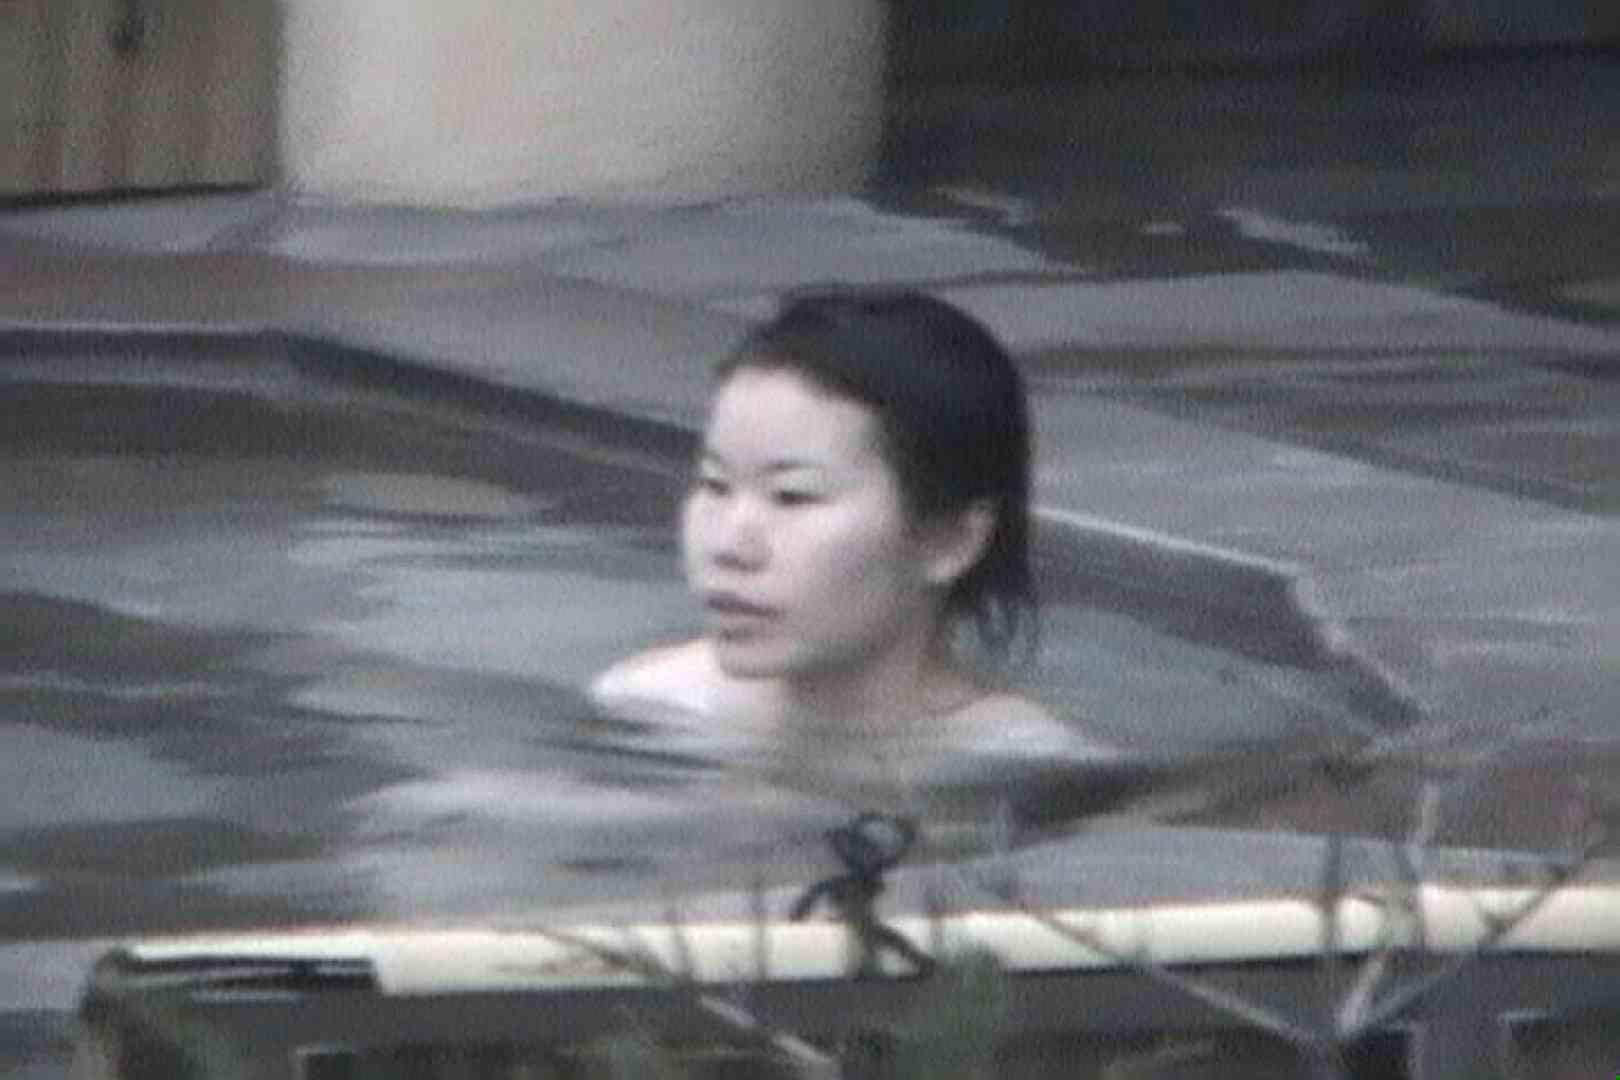 Aquaな露天風呂Vol.556 露天風呂編  99PIX 86